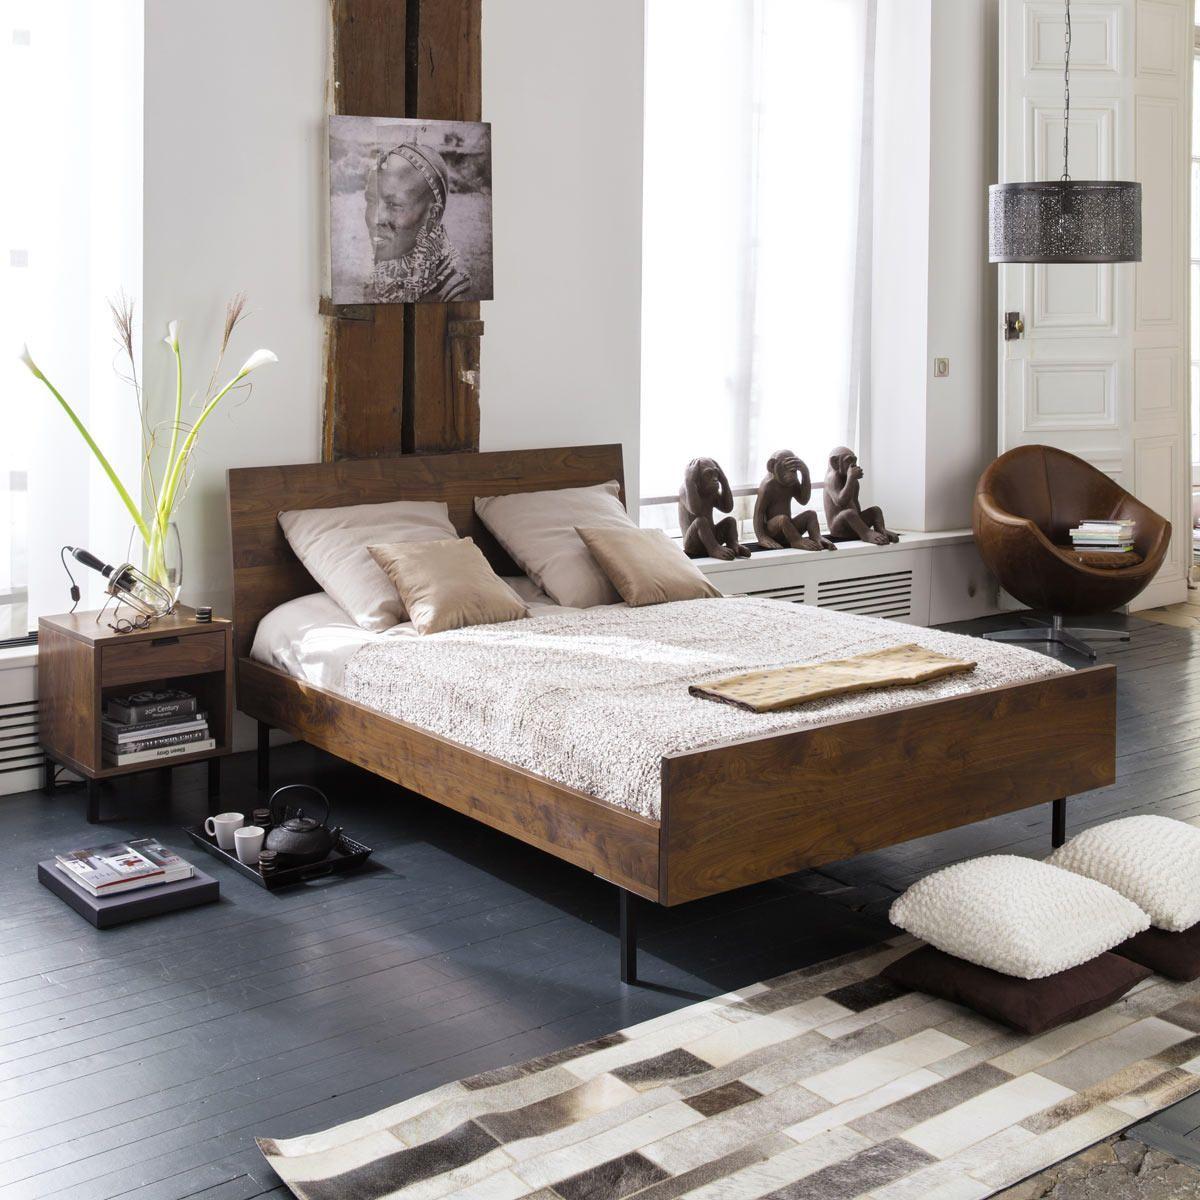 holzbett aus massivem nussbaum 140 x 190 cm berkley. Black Bedroom Furniture Sets. Home Design Ideas